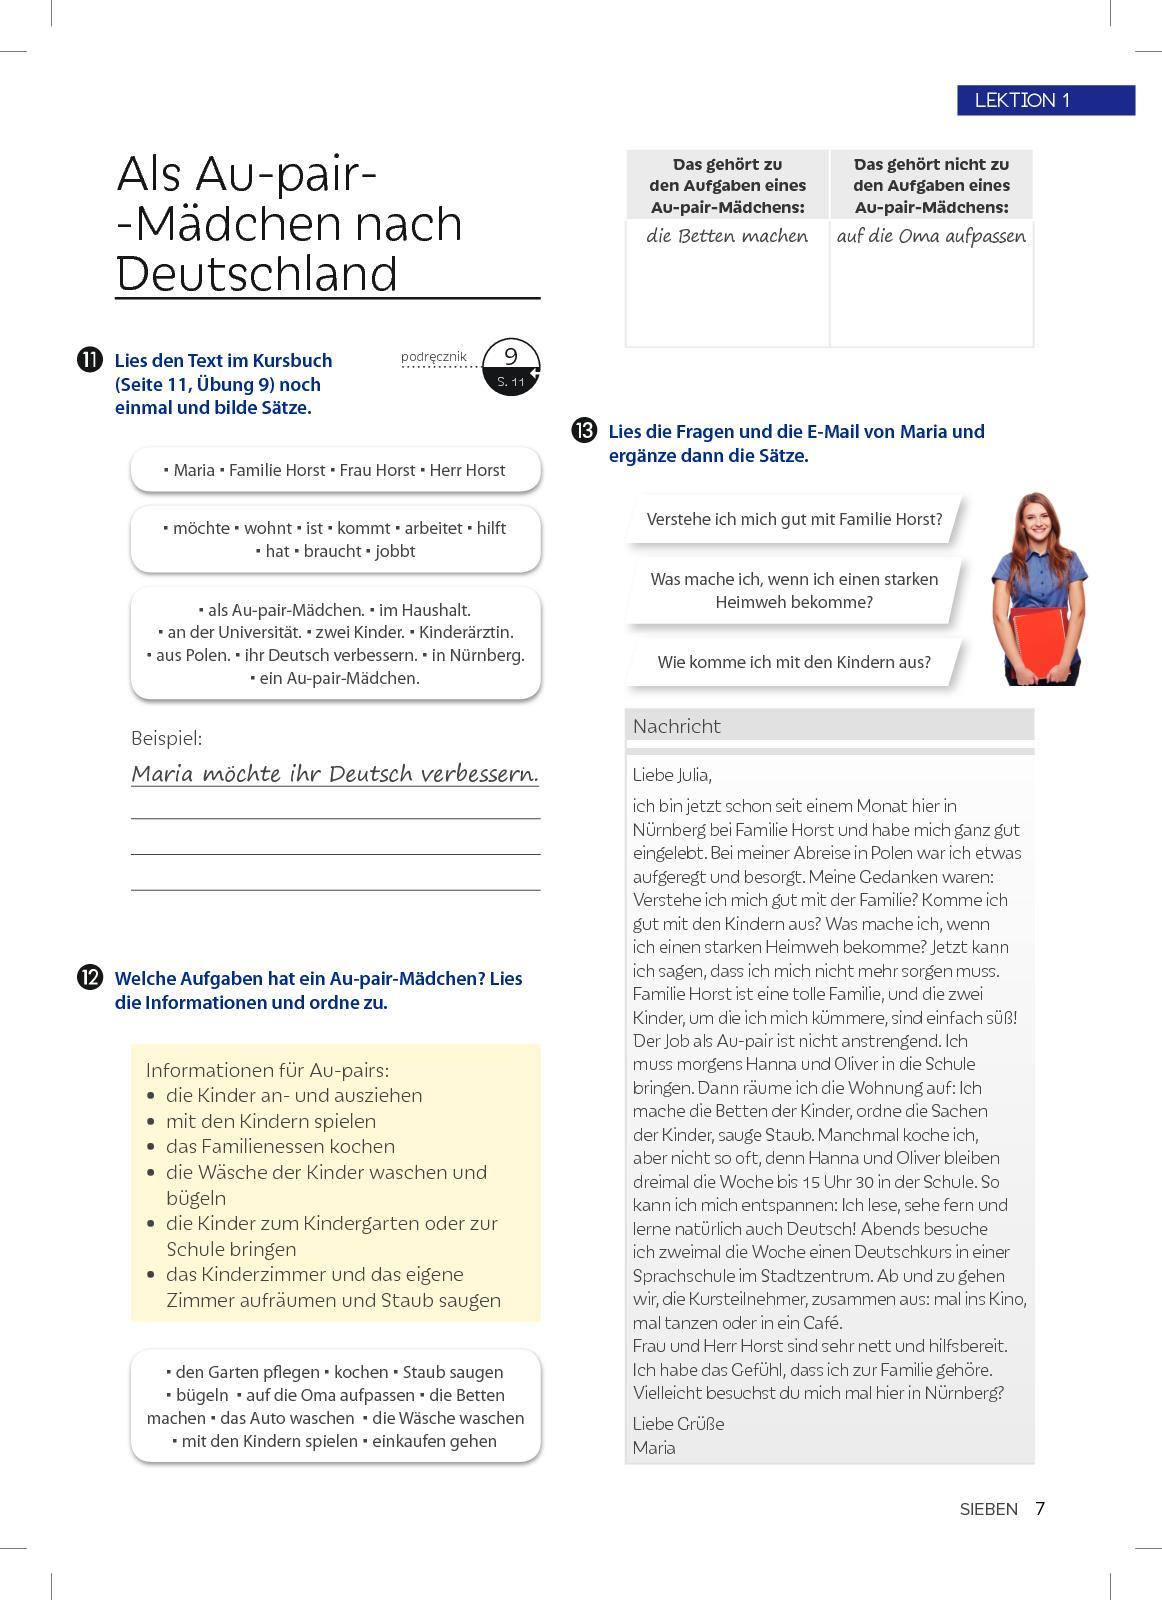 Madchen Machen Coole Sachen Kreativ Projekte Download Images ...